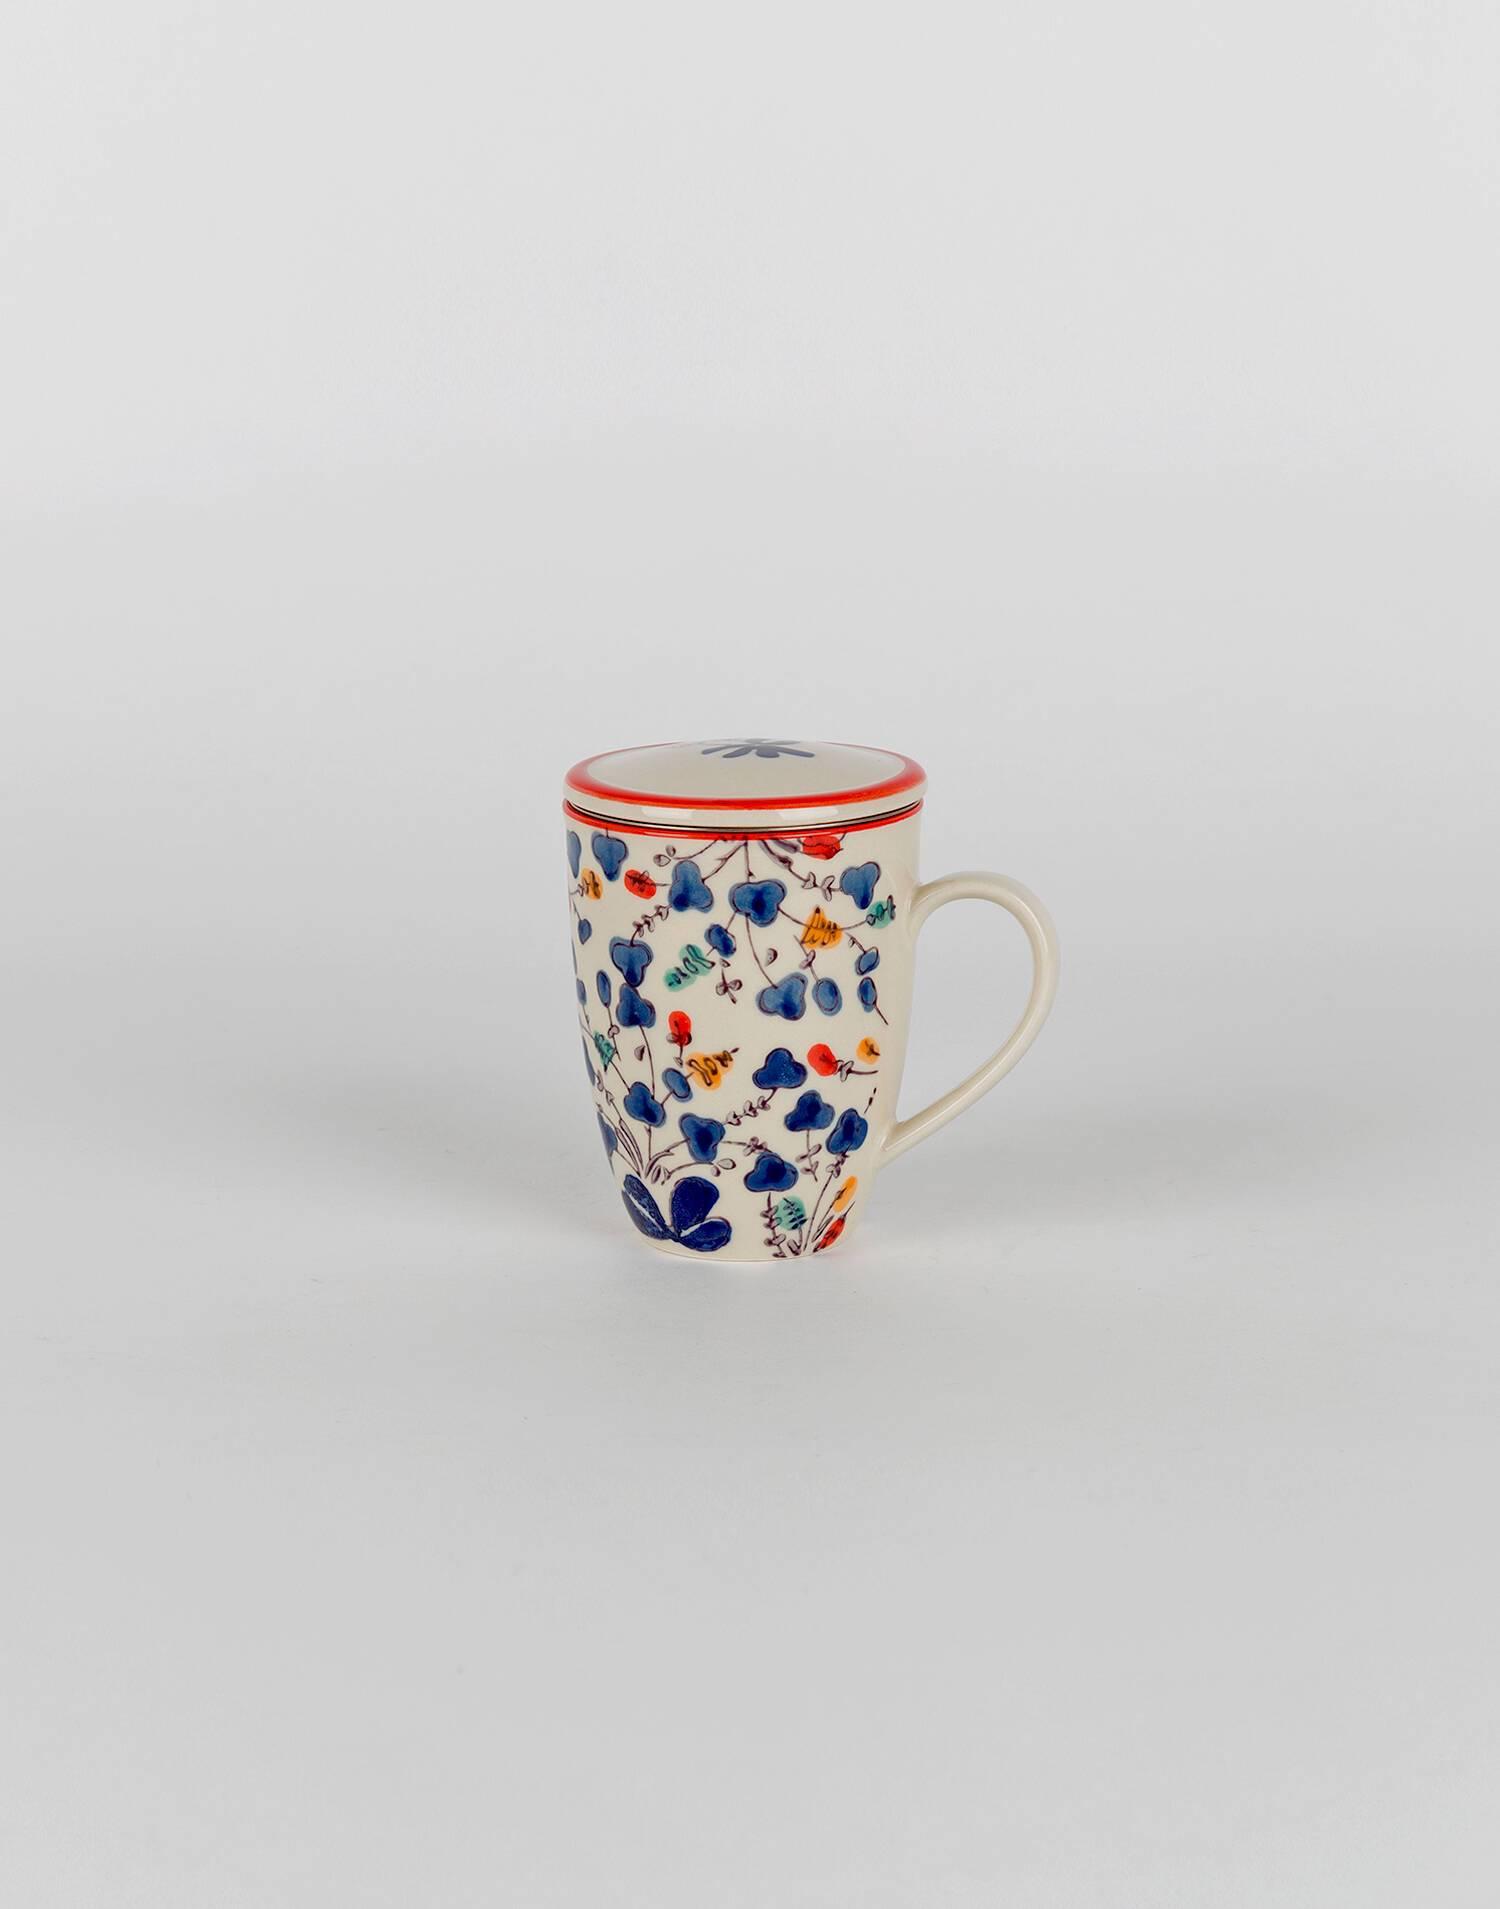 Watercolor tea mug with filter